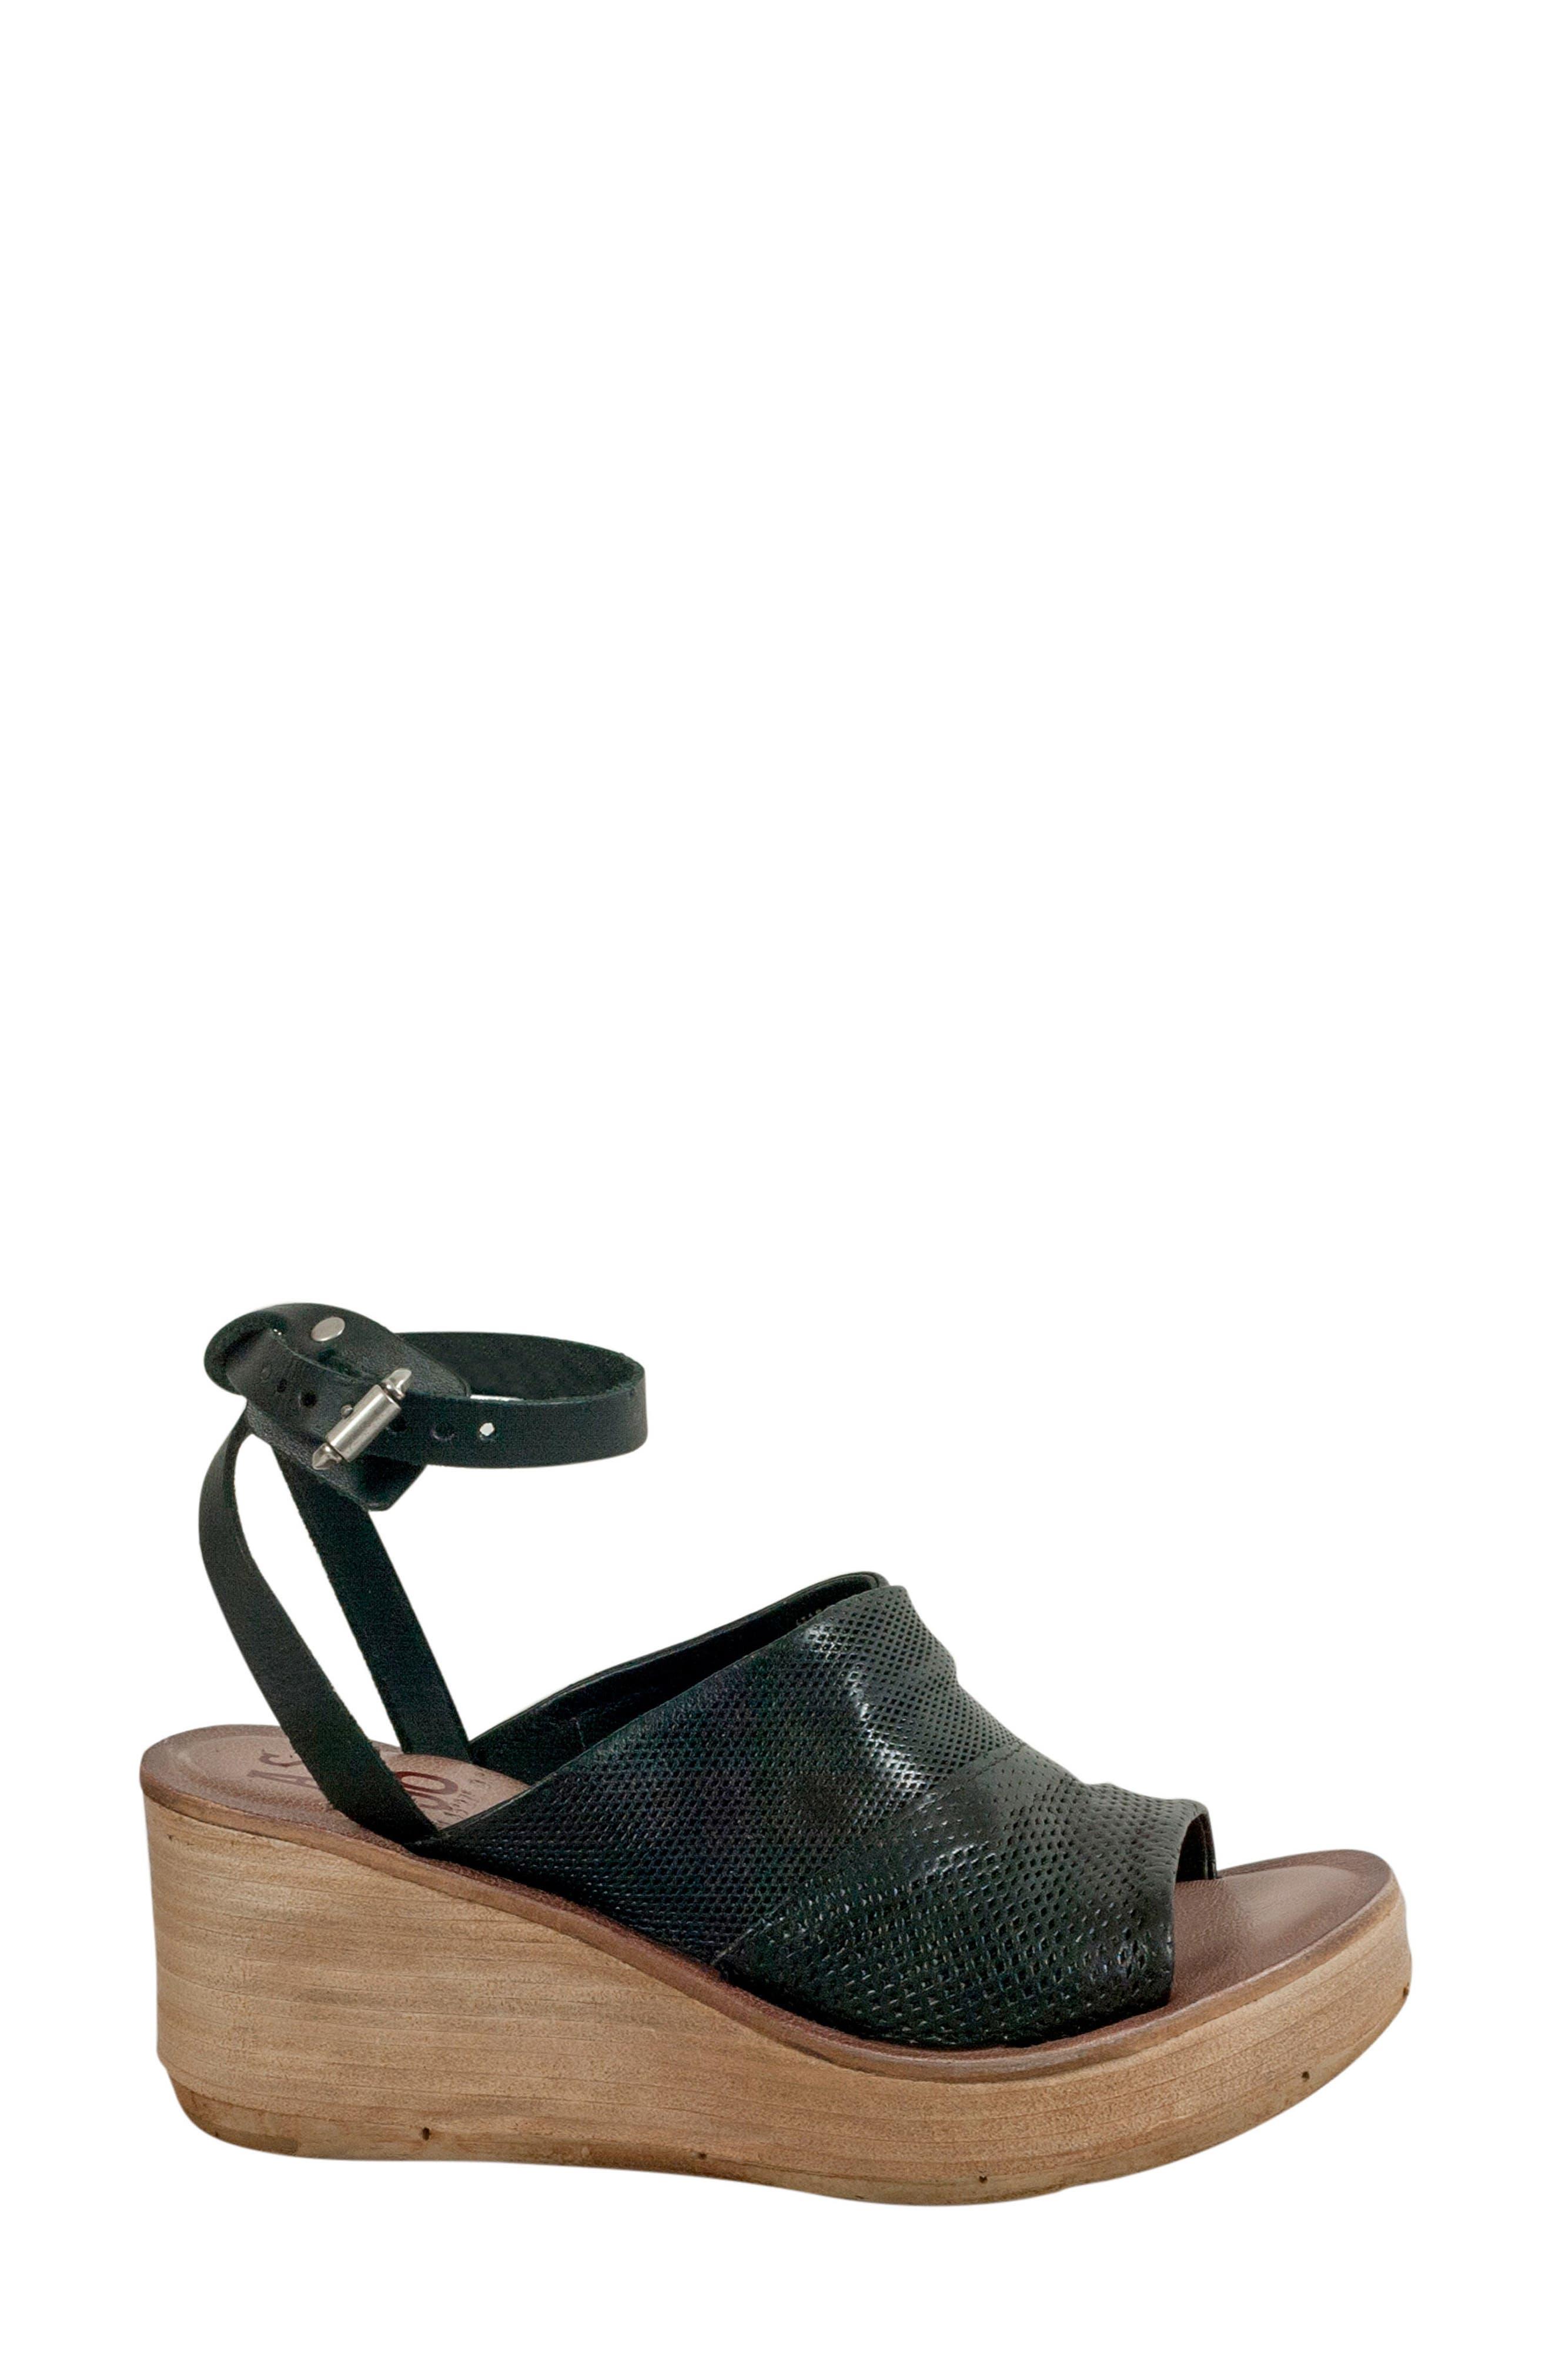 Niall Platform Wedge Sandal,                             Alternate thumbnail 5, color,